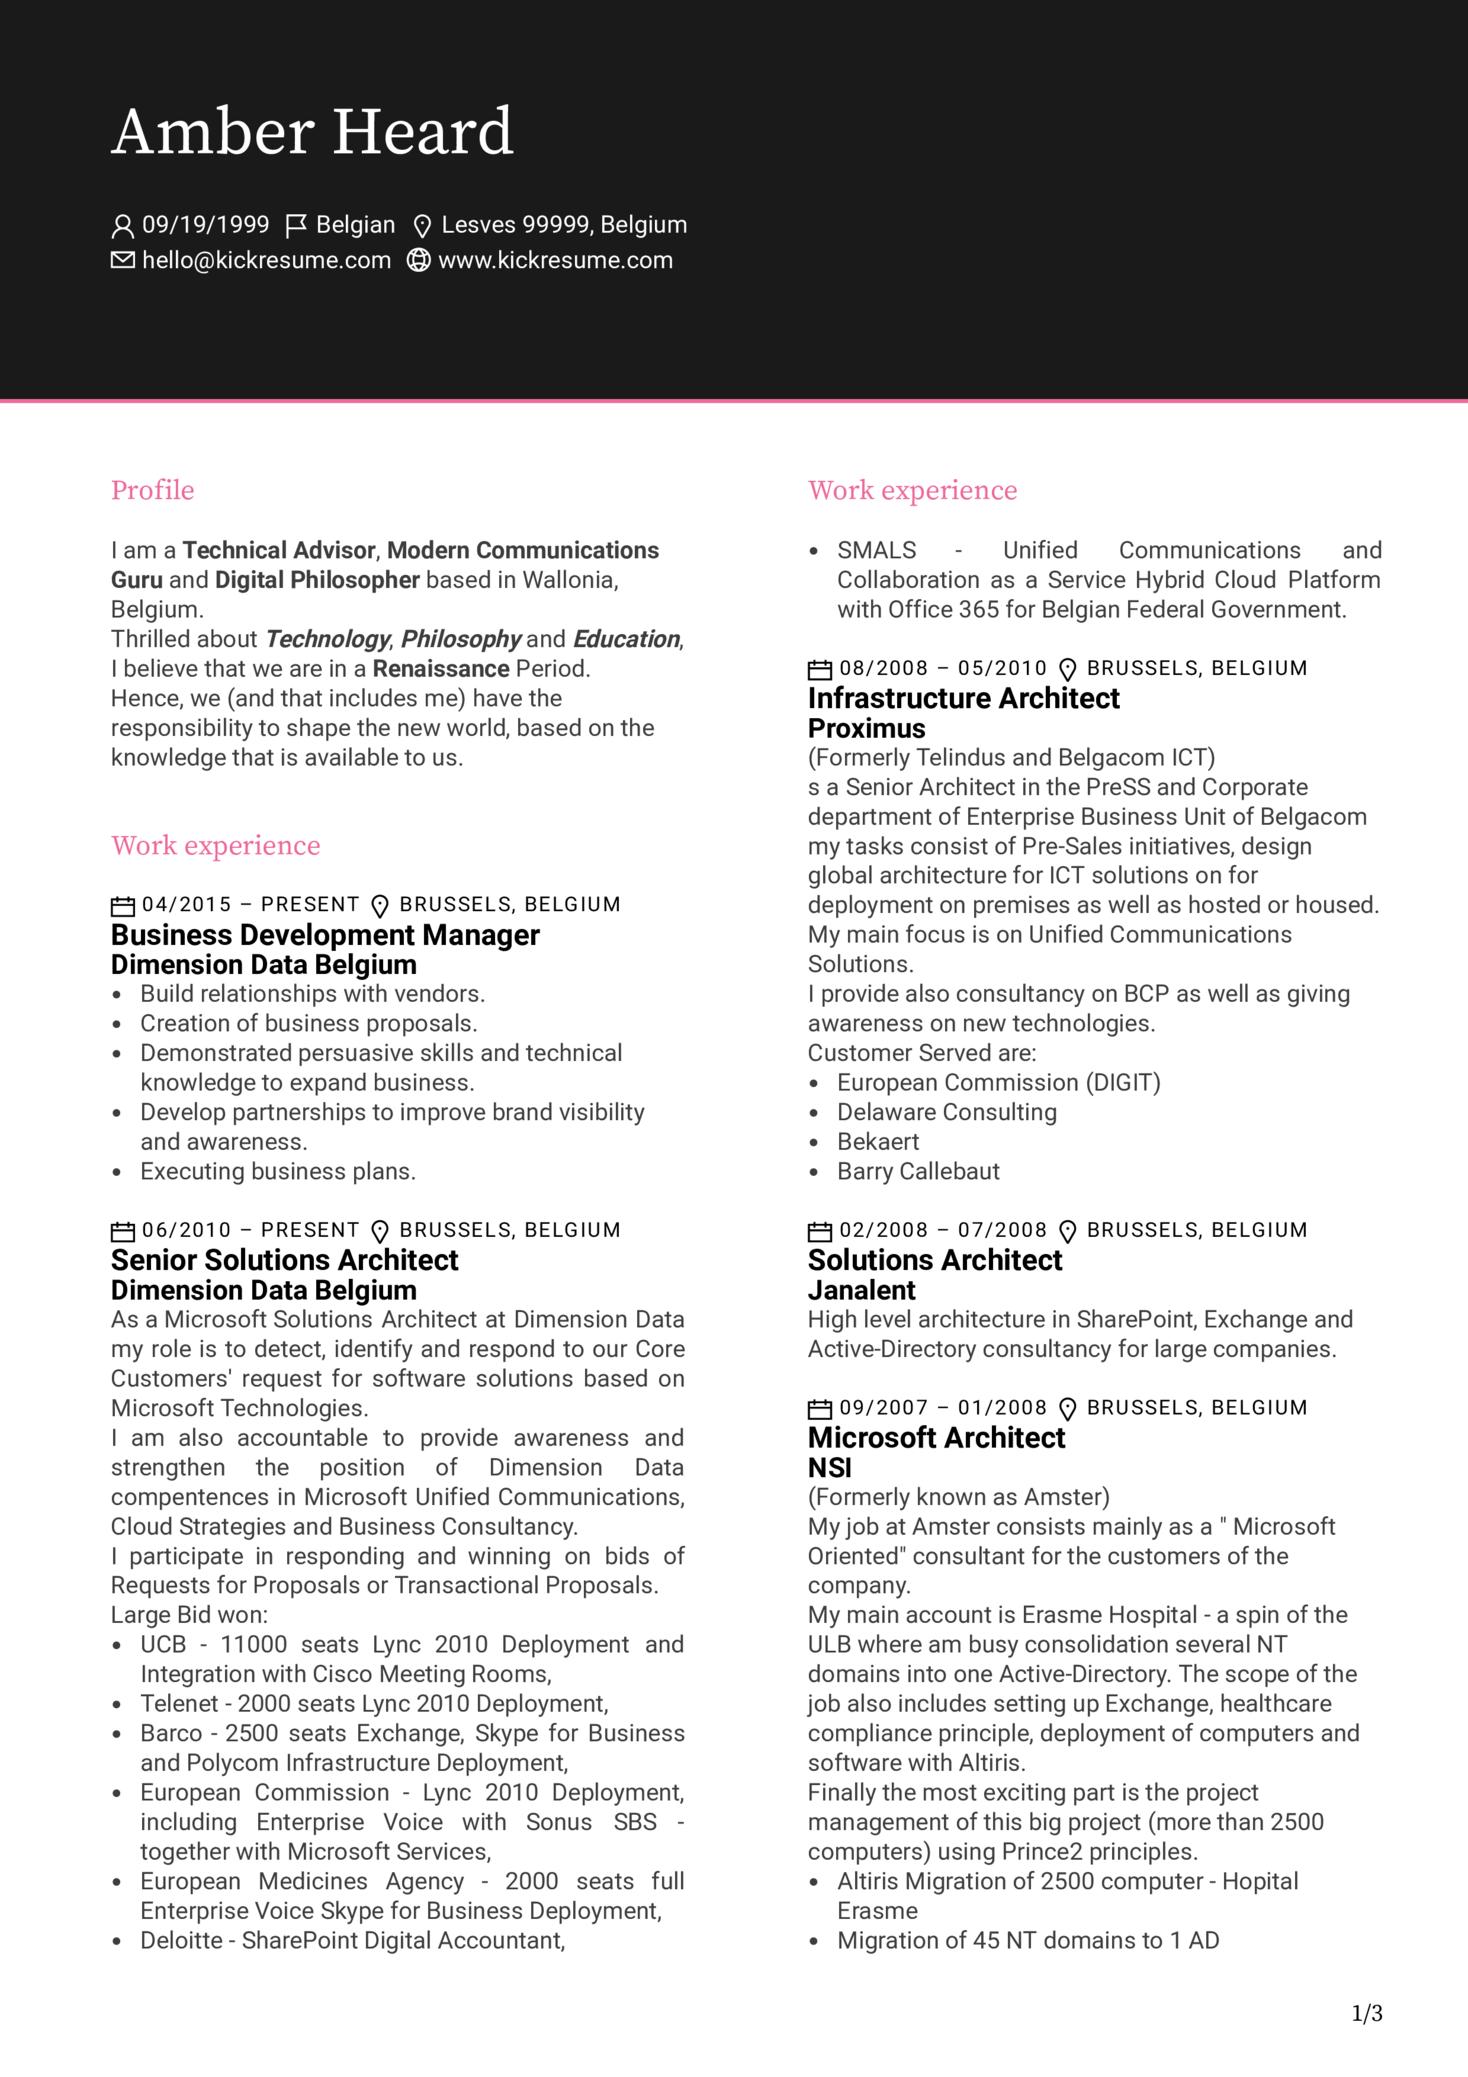 Experienced Business Development Manager CV Sample (Part 1)